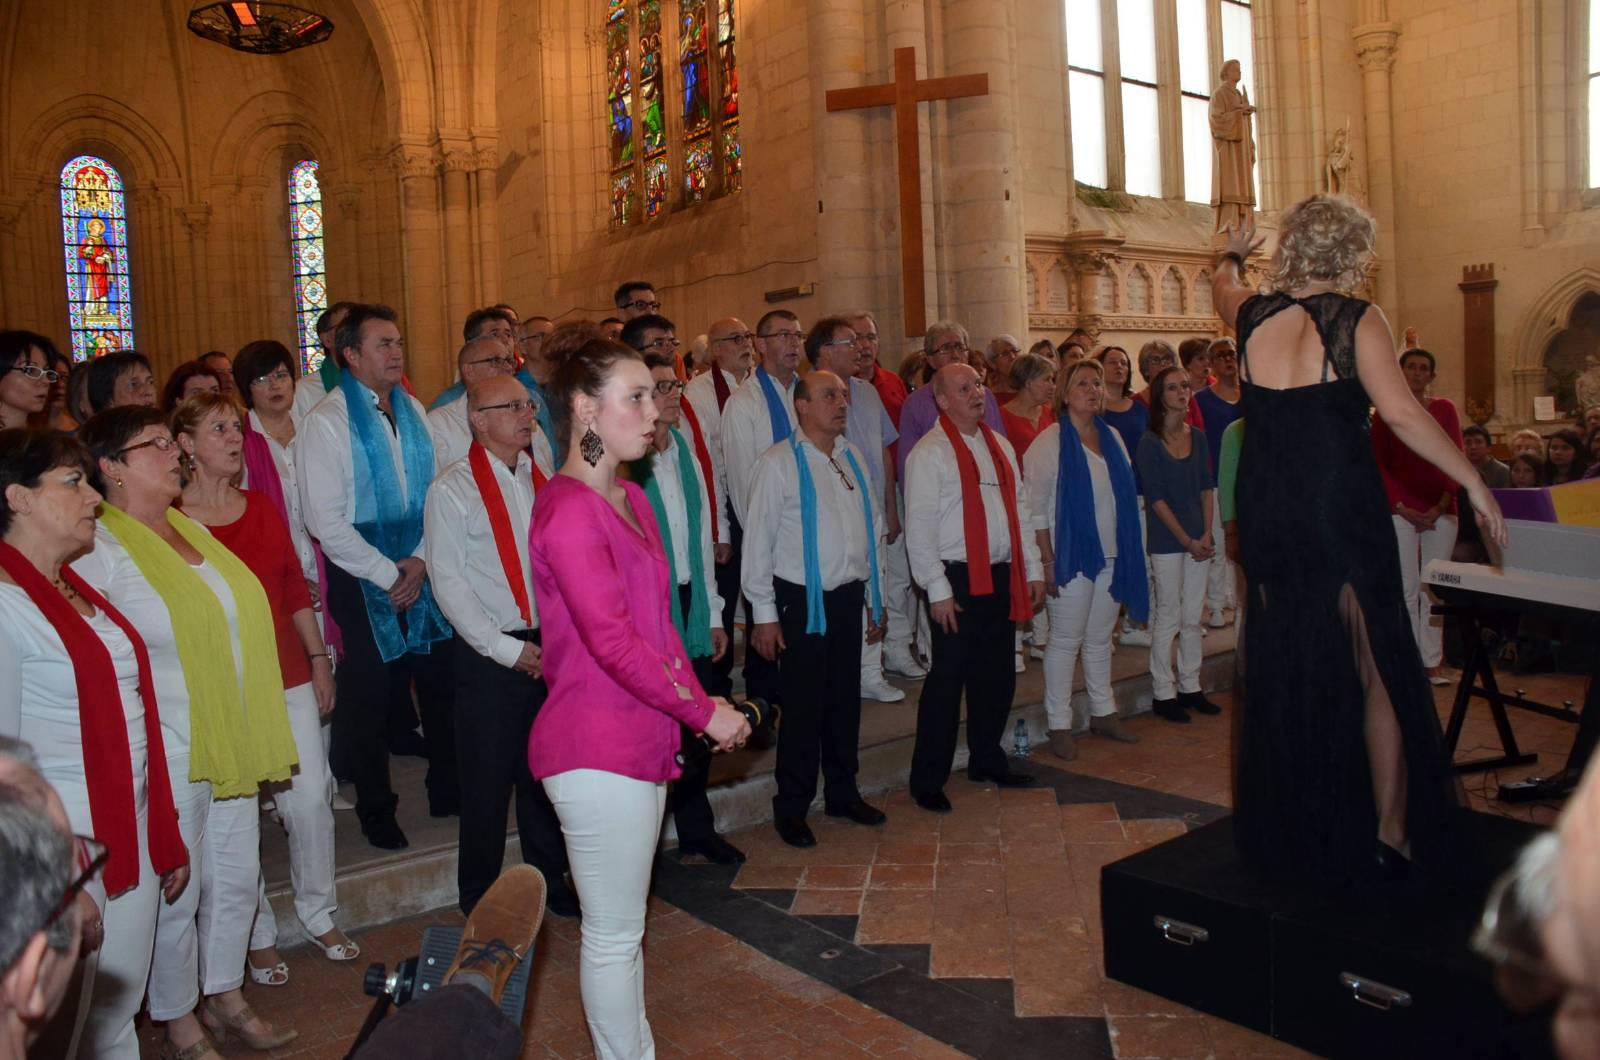 Concert Plessis Grammoire 01-03-2015